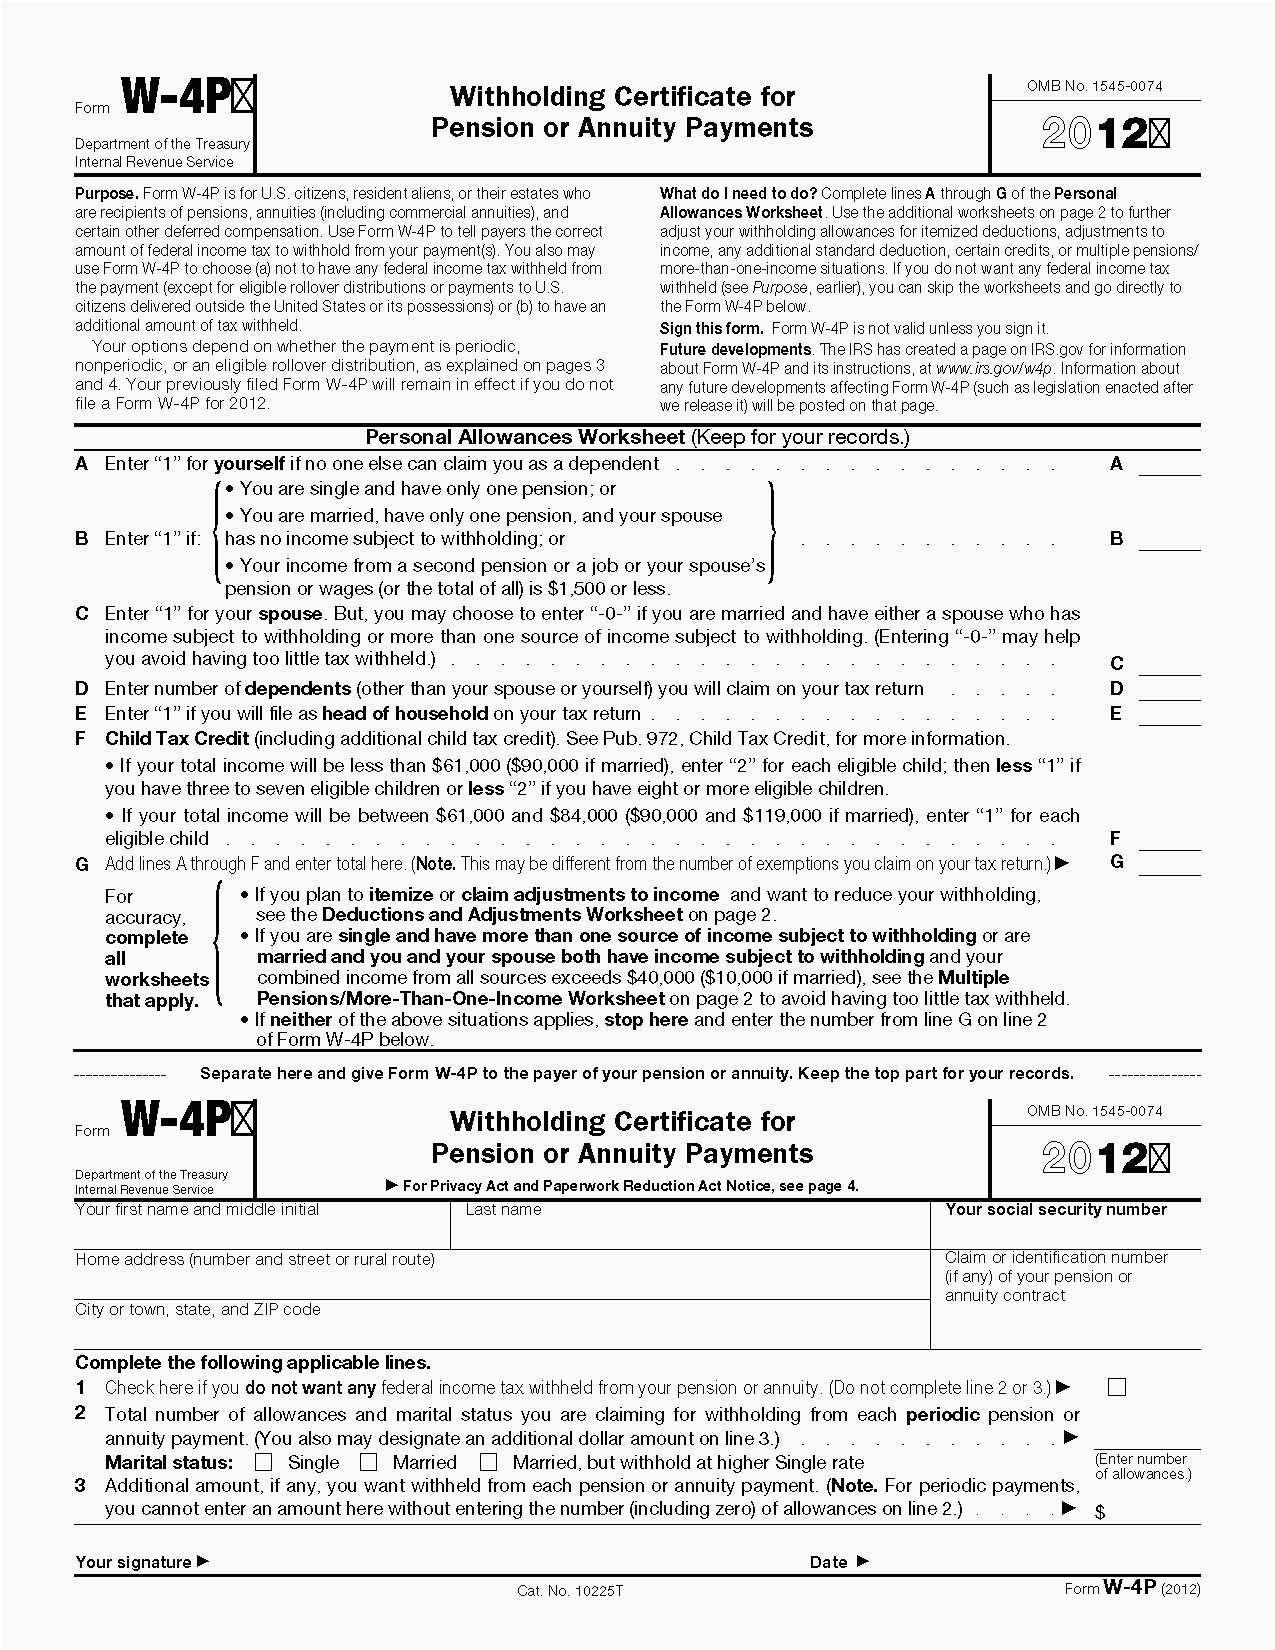 Irs Tax Forms 2018 W 4